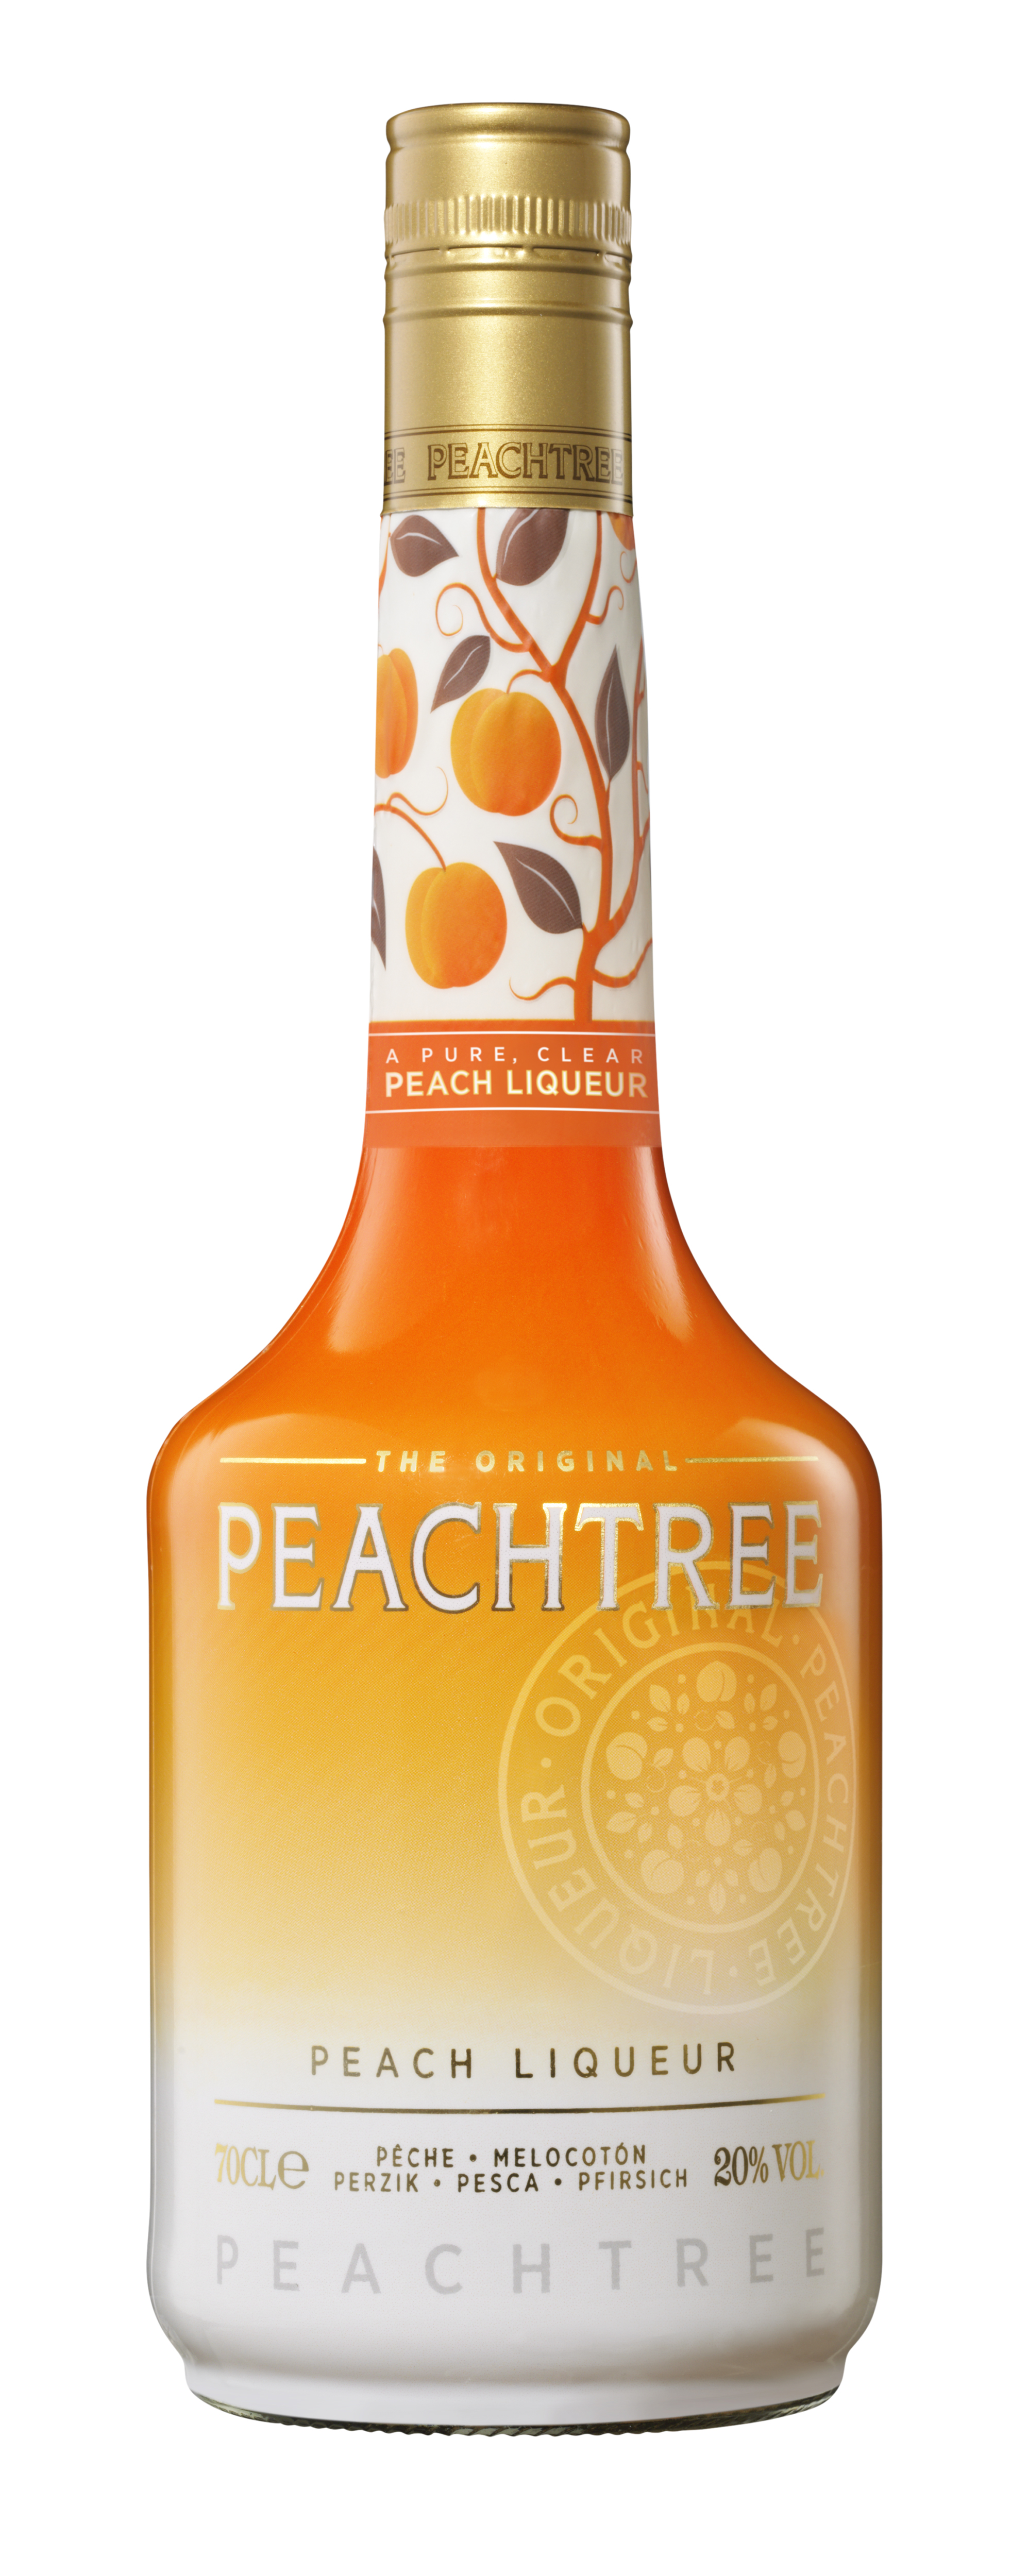 Peach tree vinmonopolet